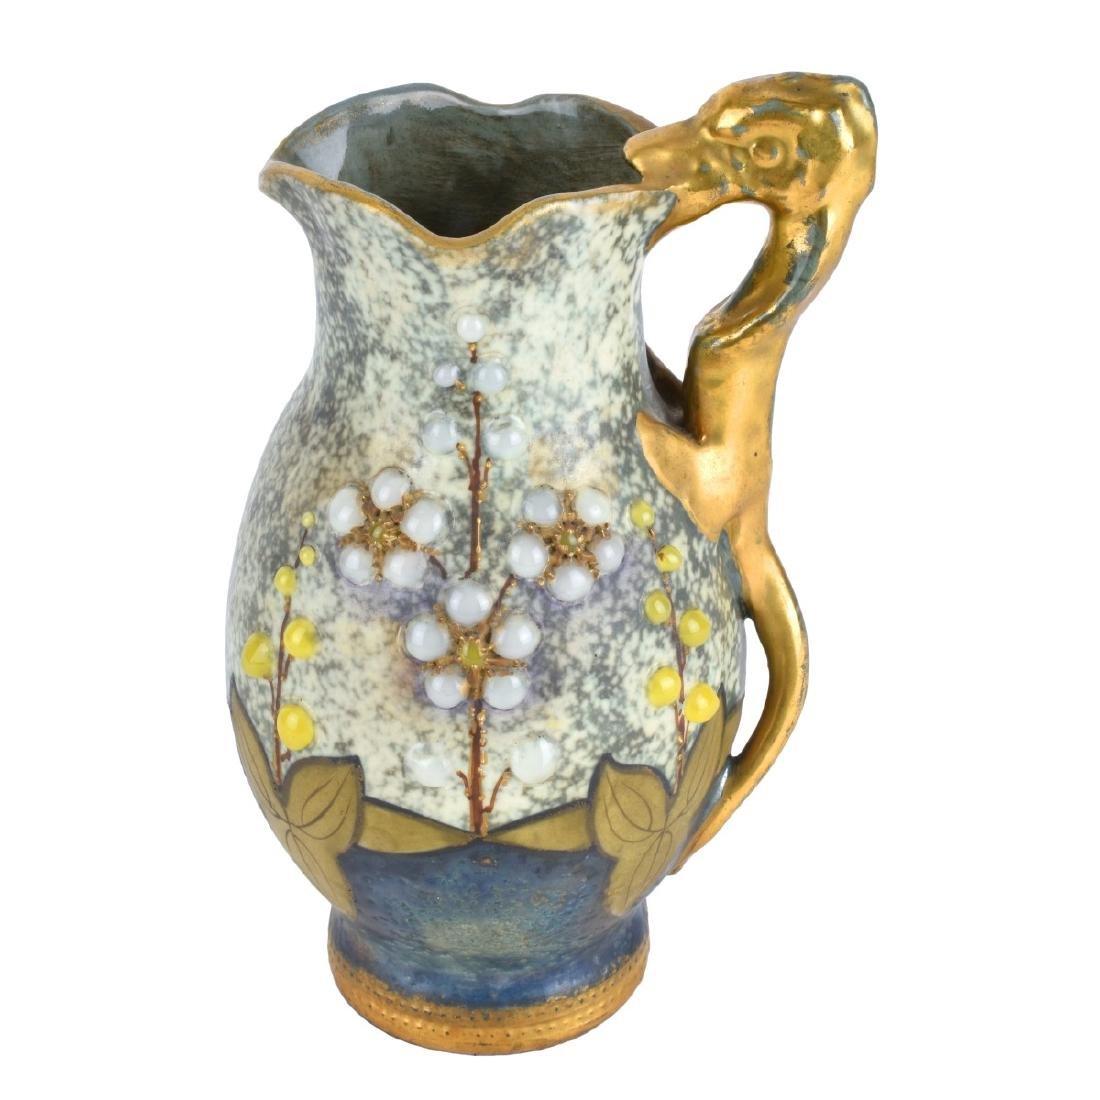 Amphora Austria Gres Bijoux Jeweled Pitcher